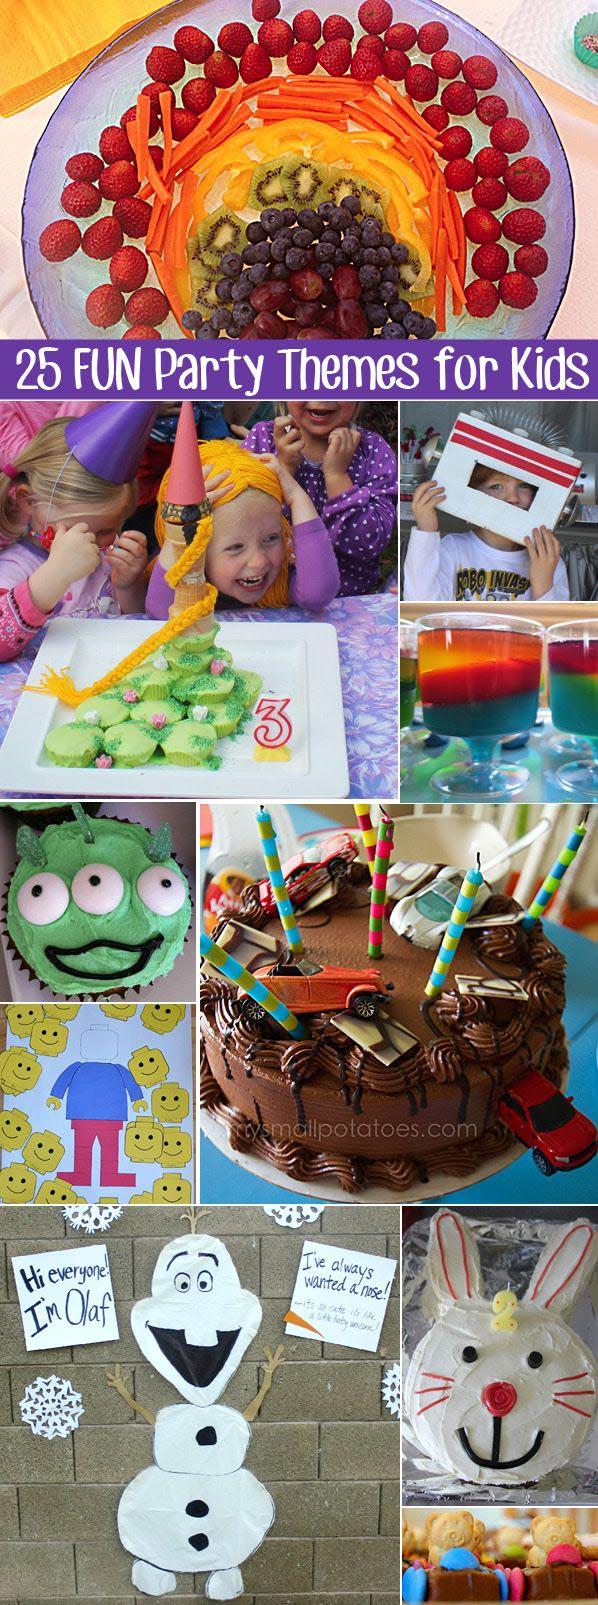 fun party theme ideas home party ideas